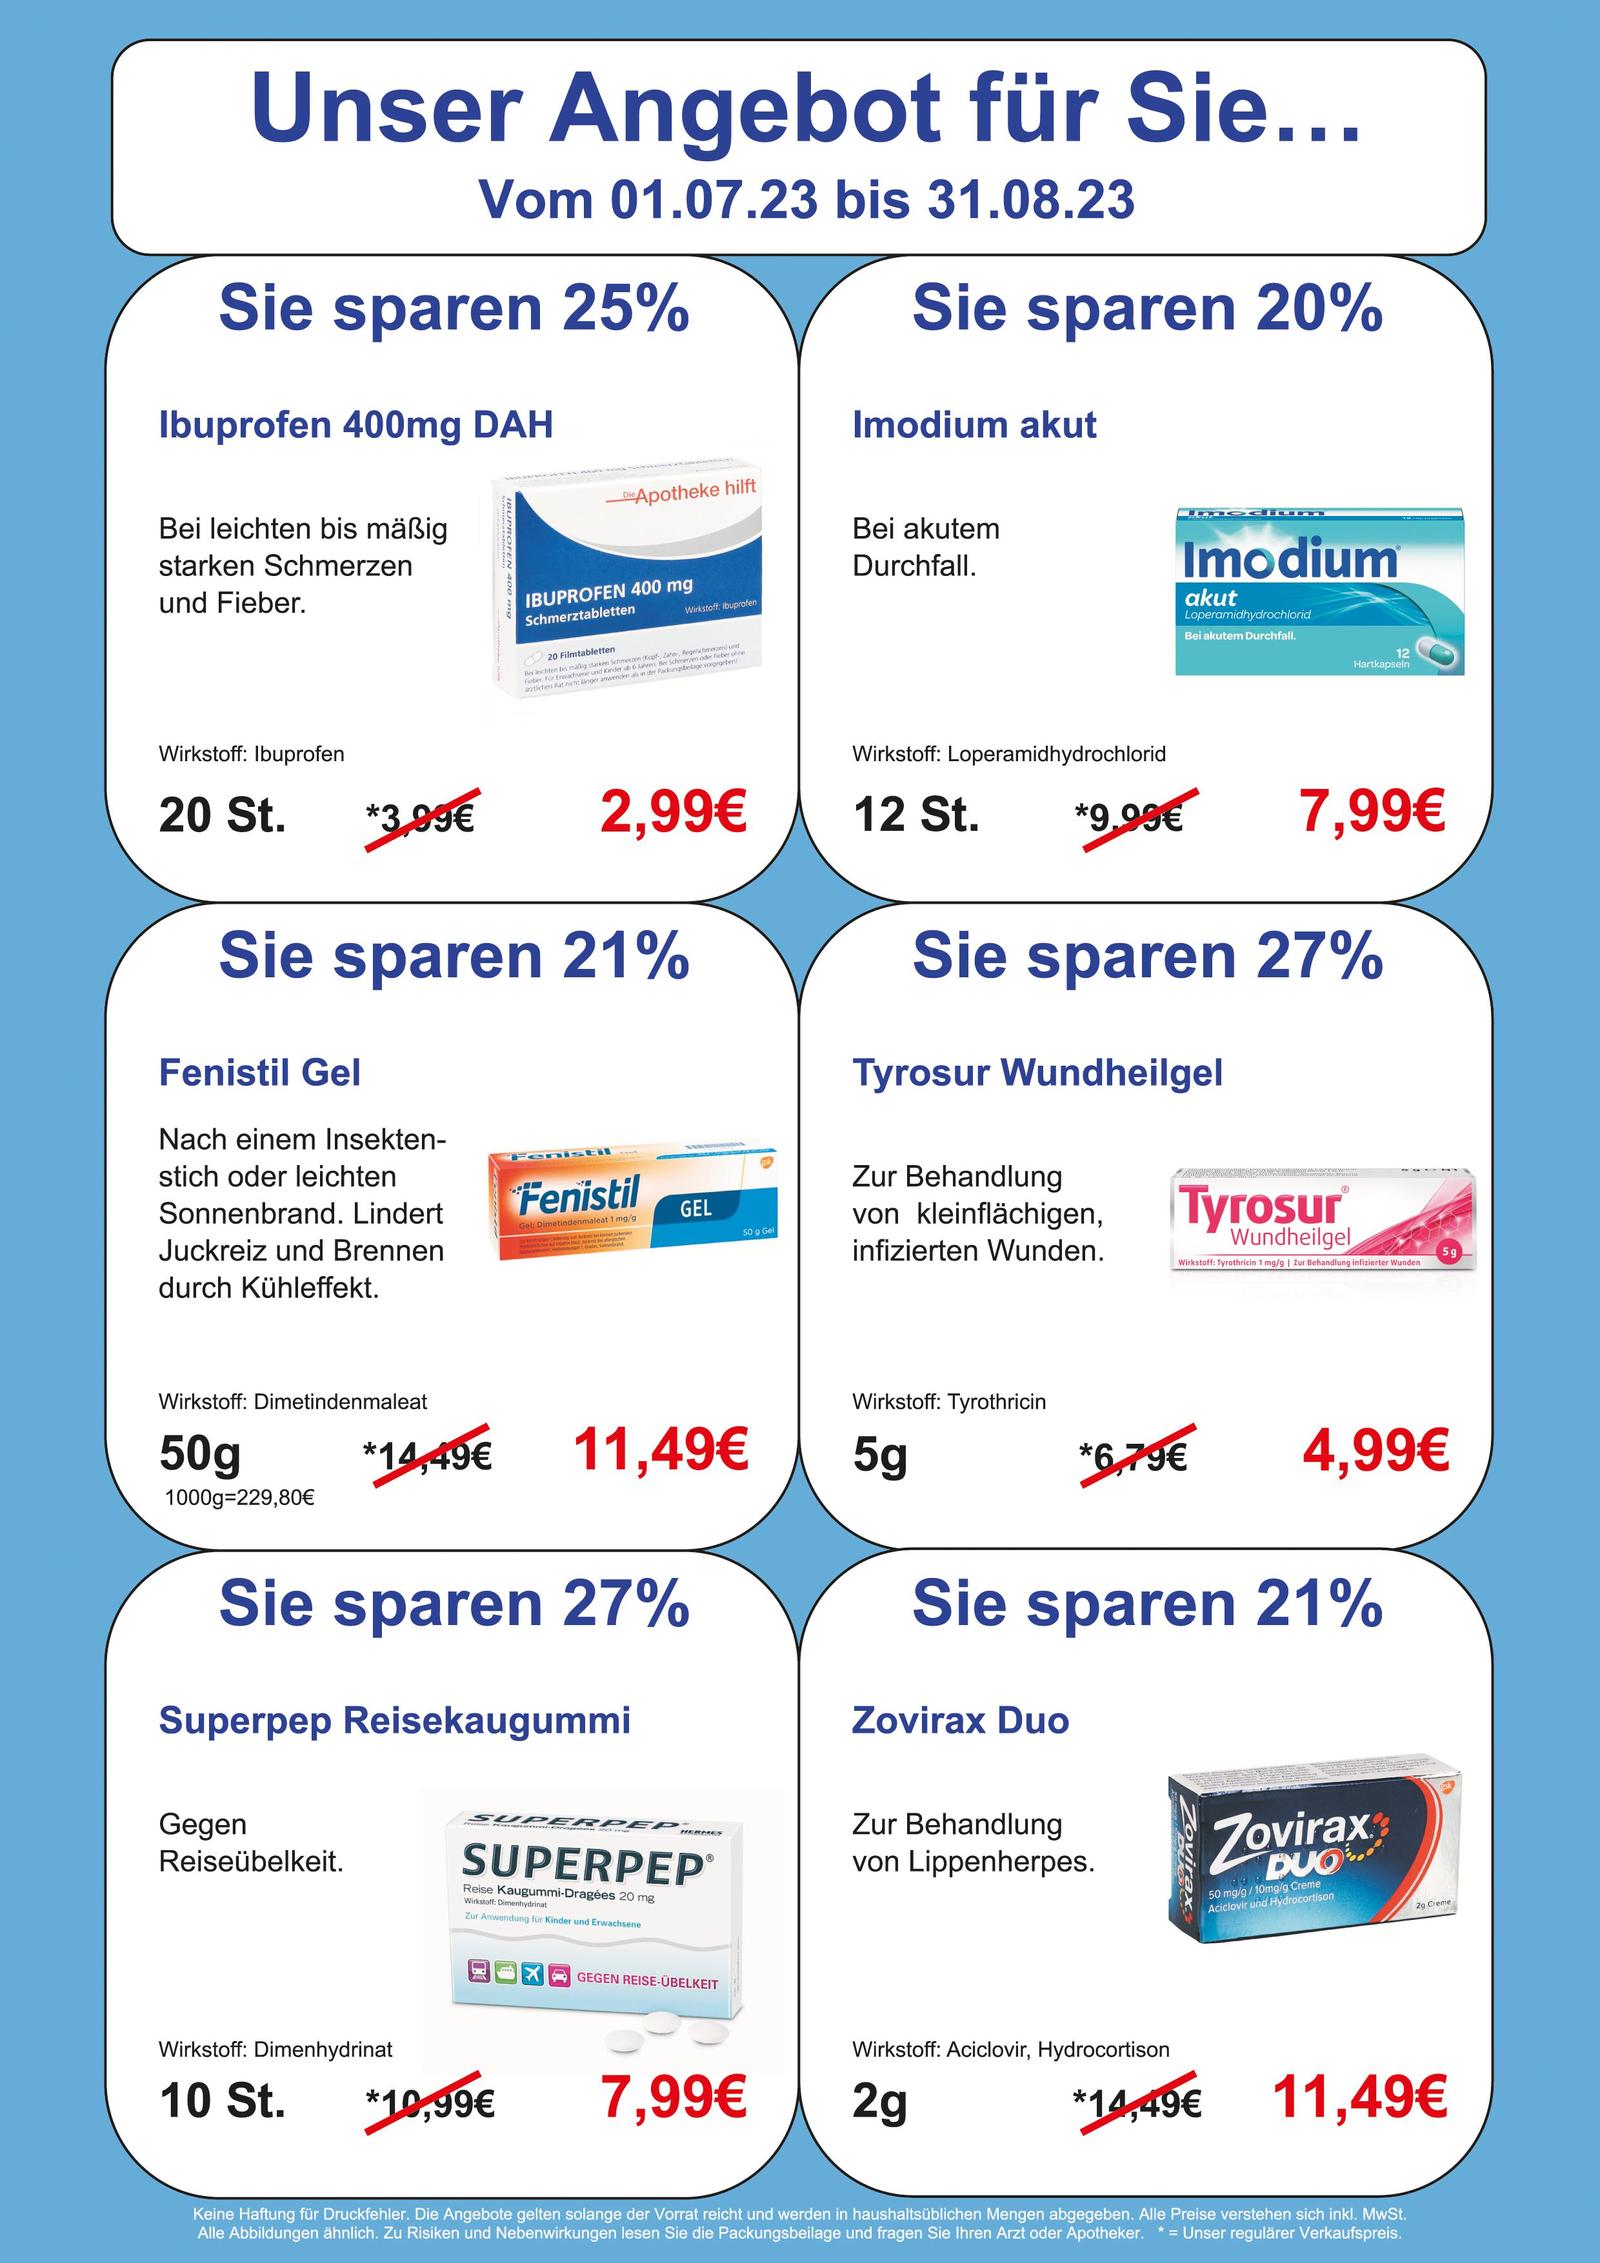 https://mein-uploads.apocdn.net/21722/leaflets/21722_flyer-Seite2.png